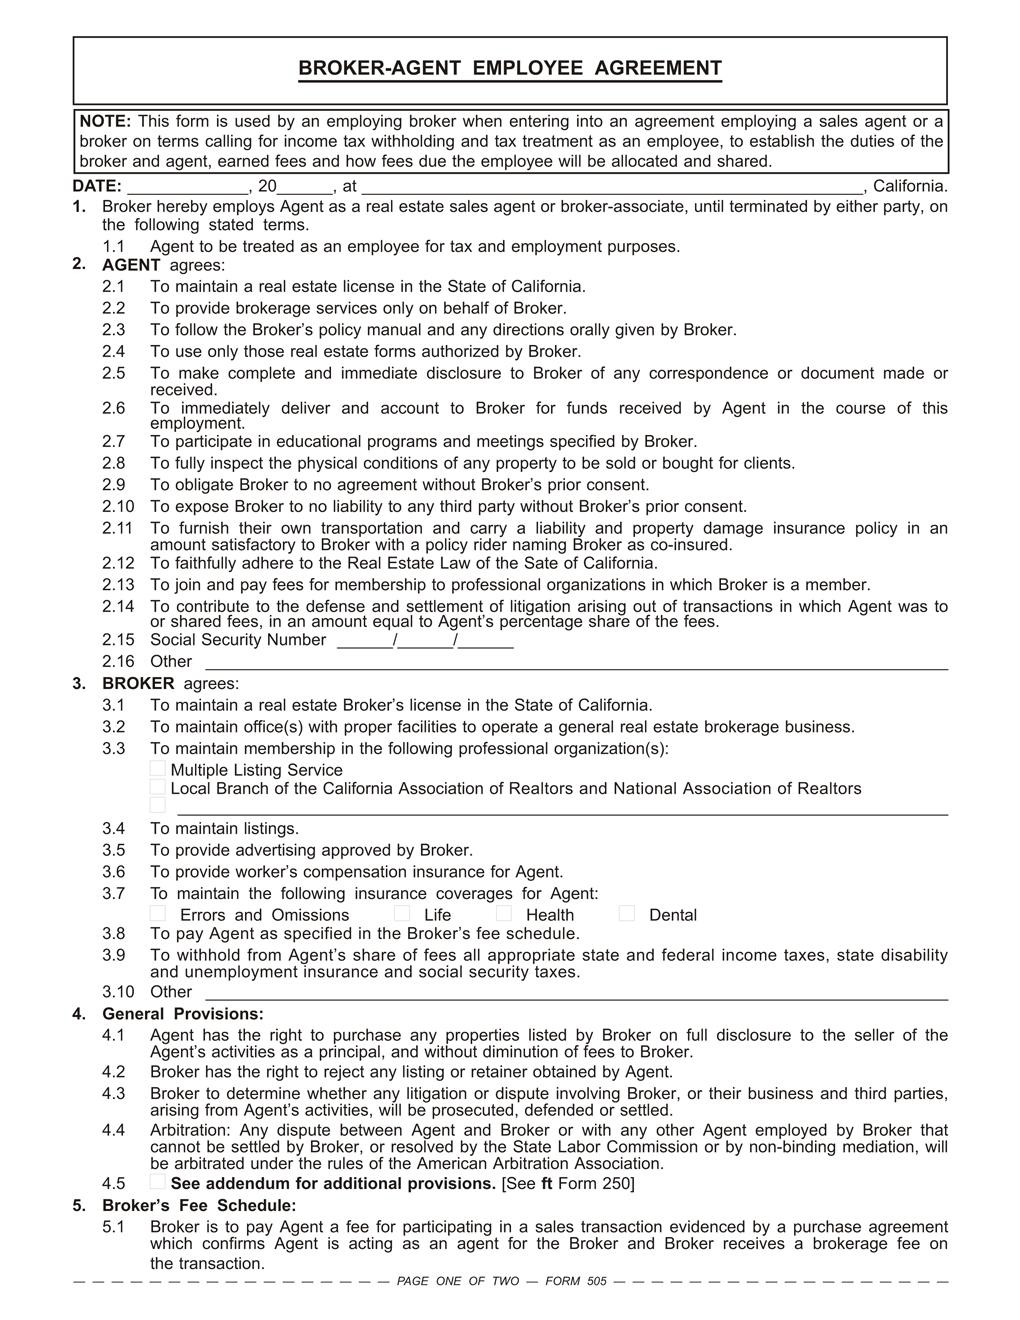 Broker Agent Employee Agreement Rpi Form 505 First